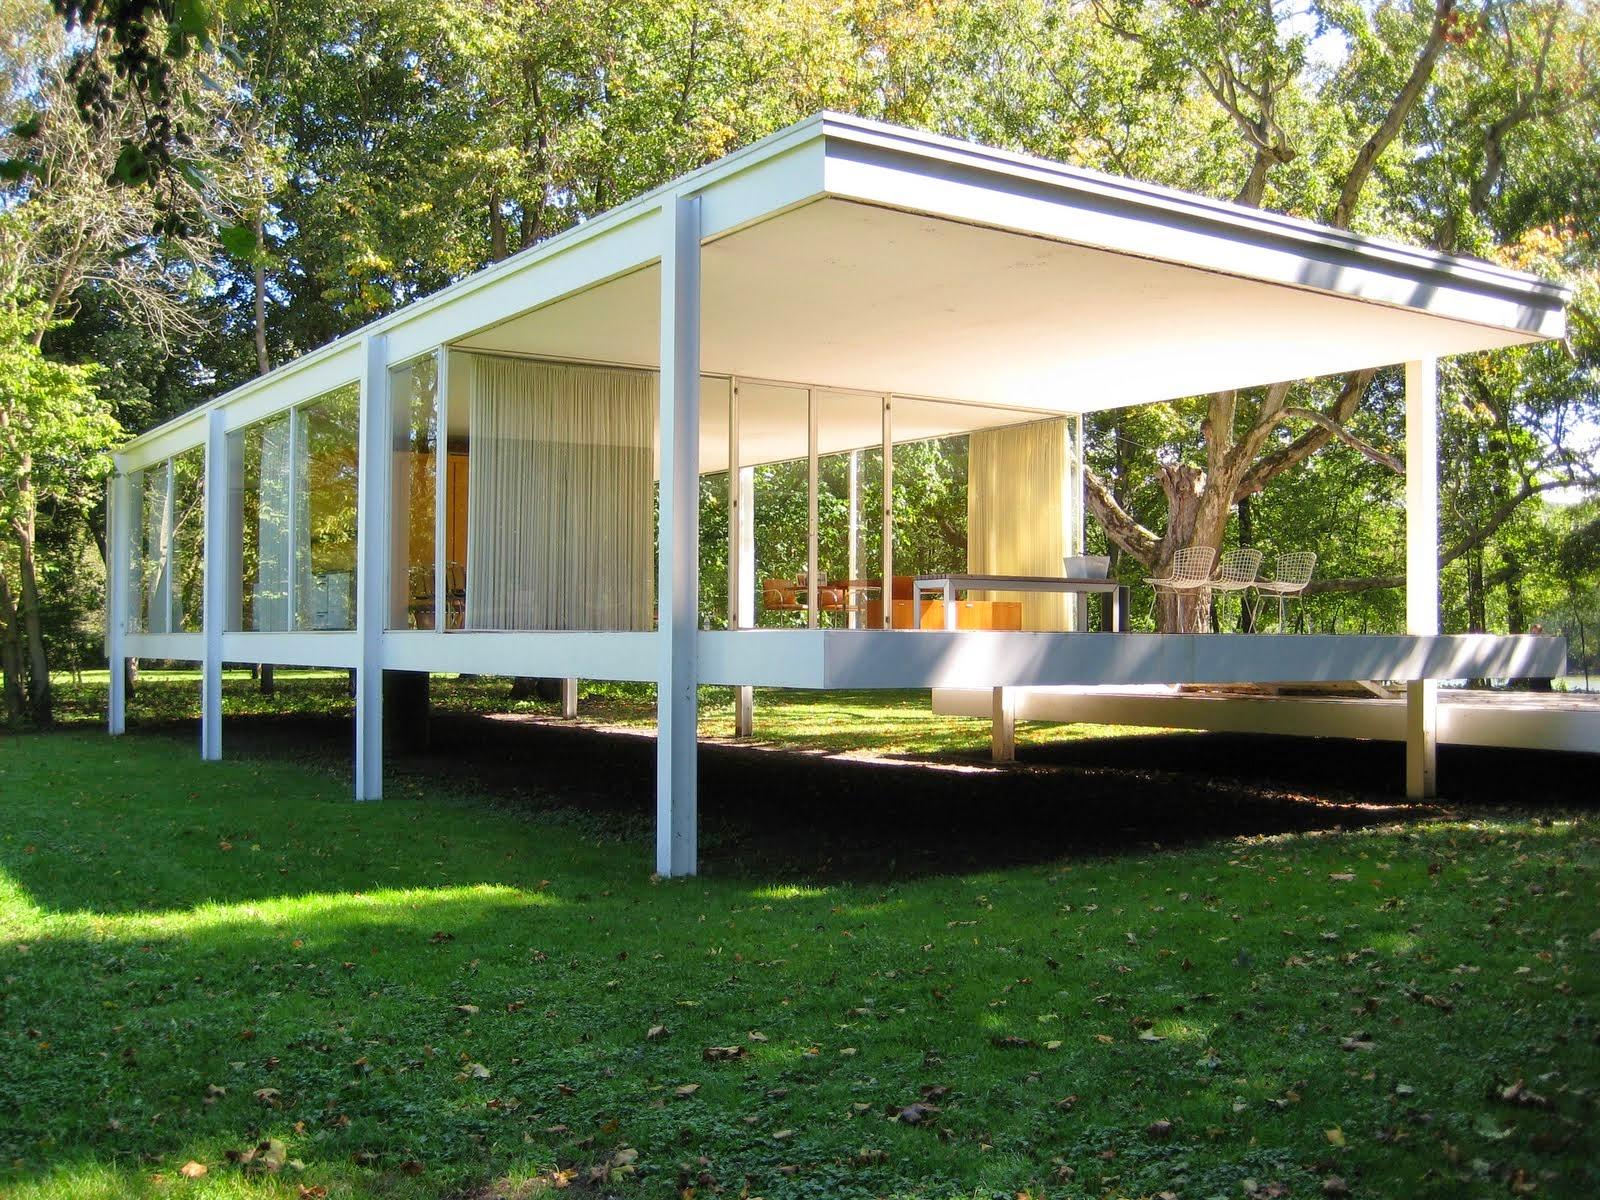 Casa farnsworth farnsworth house arquitectura asombrosa for Casa minimalista de mies van der rohe